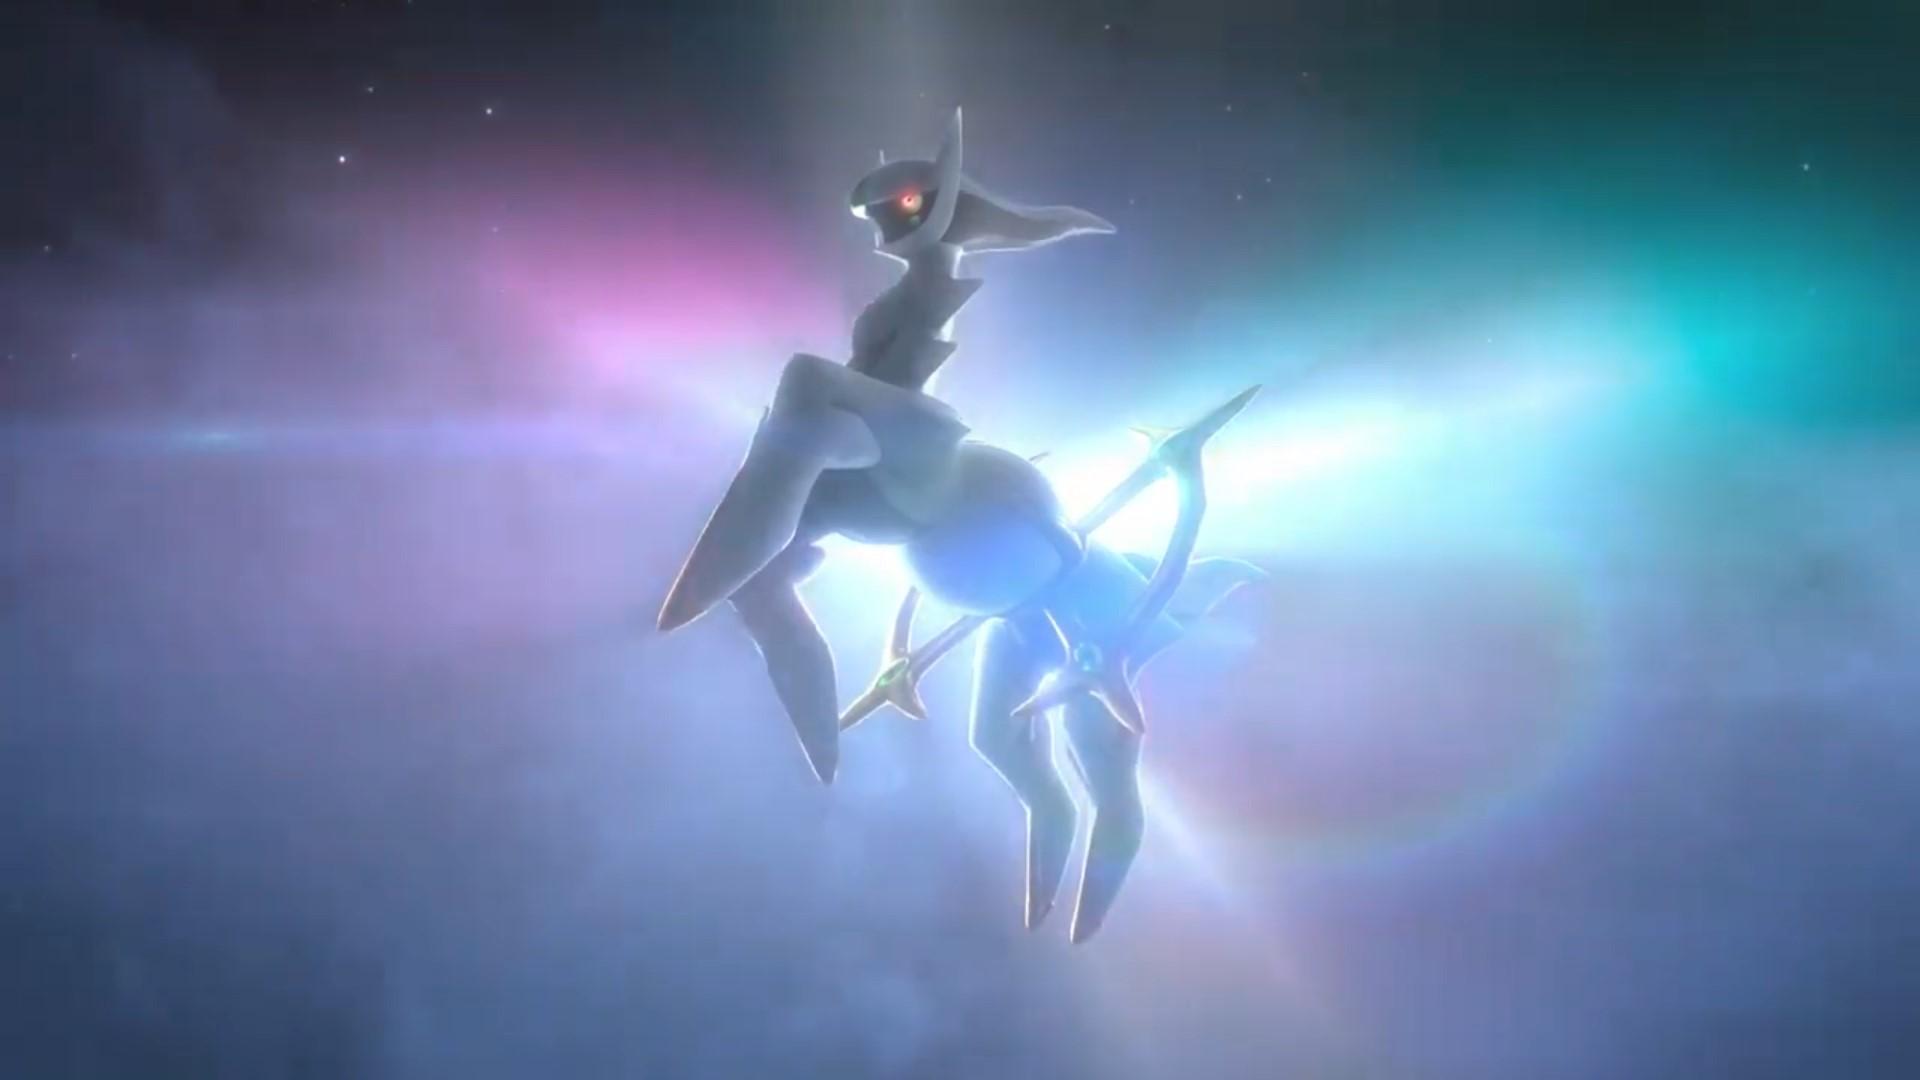 Game Freak announces the Zelda: Breath of the Wild-like Pokémon Legends Arceus